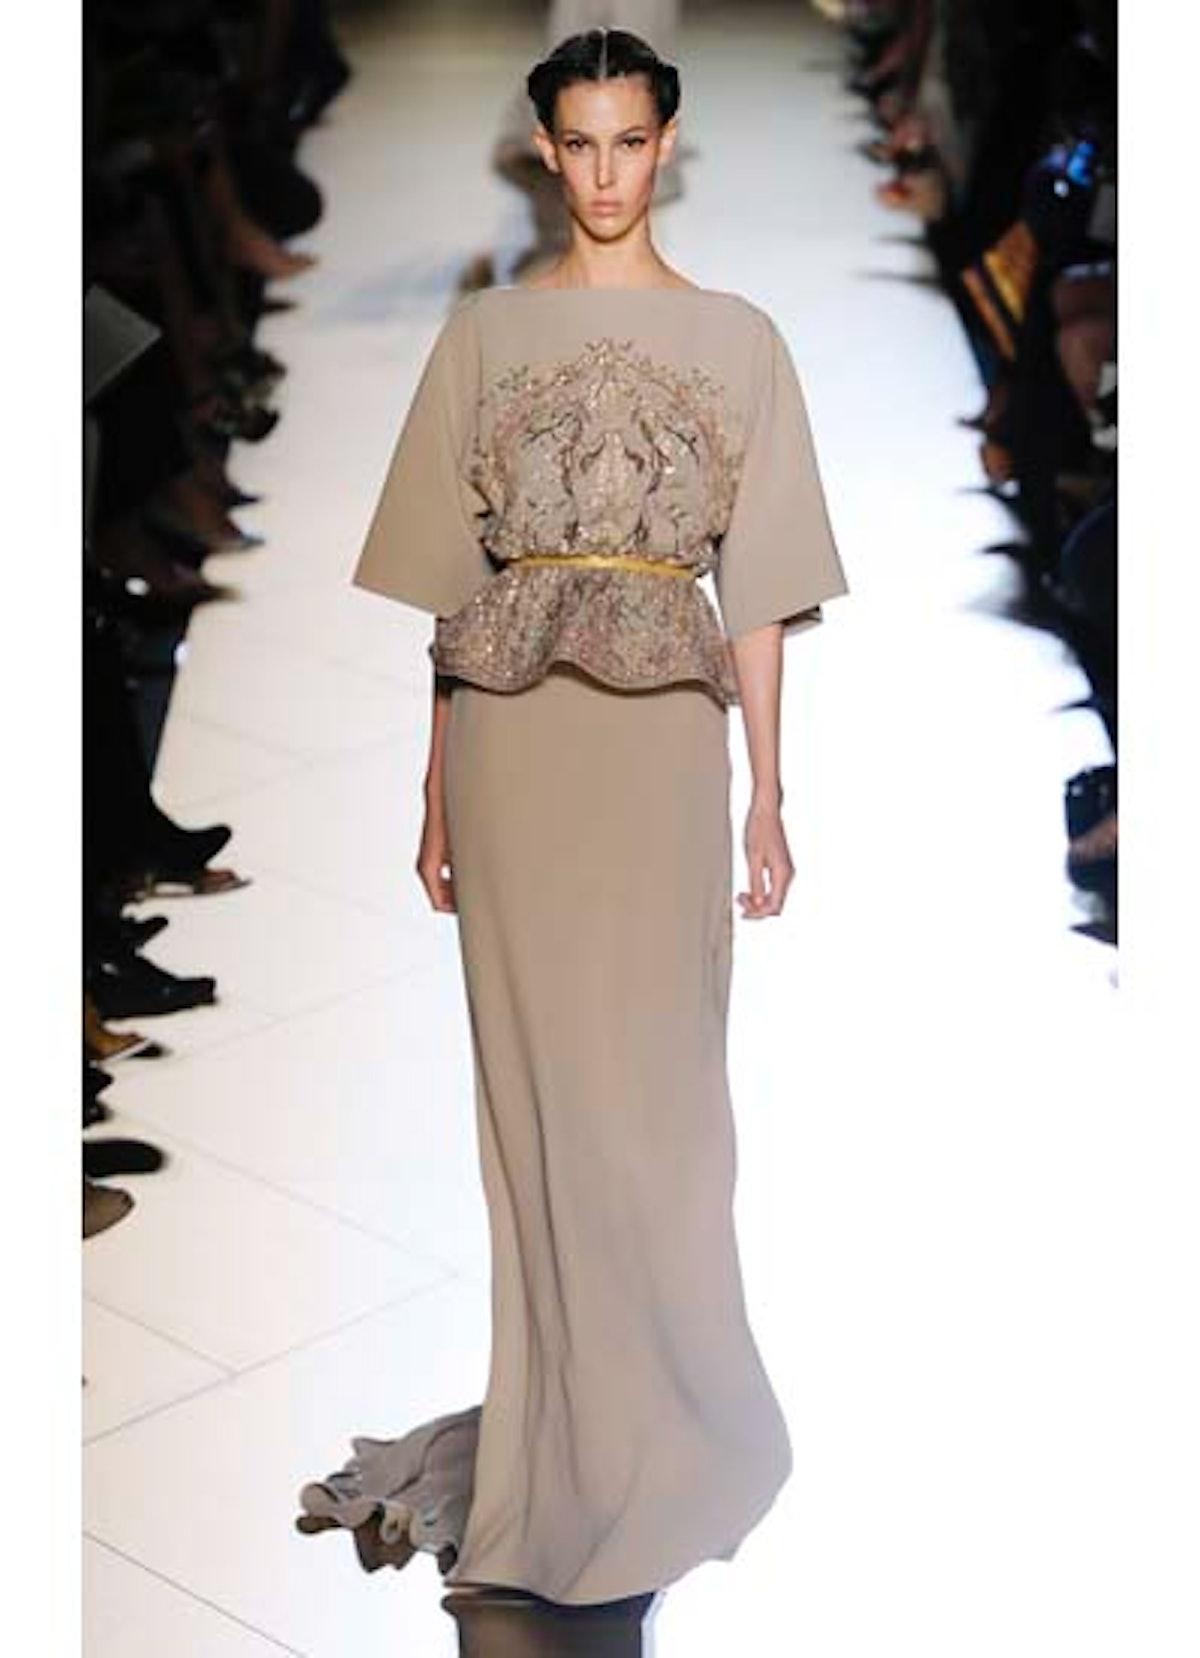 fass-elie-saab-couture-2012-runway-35-v.jpg